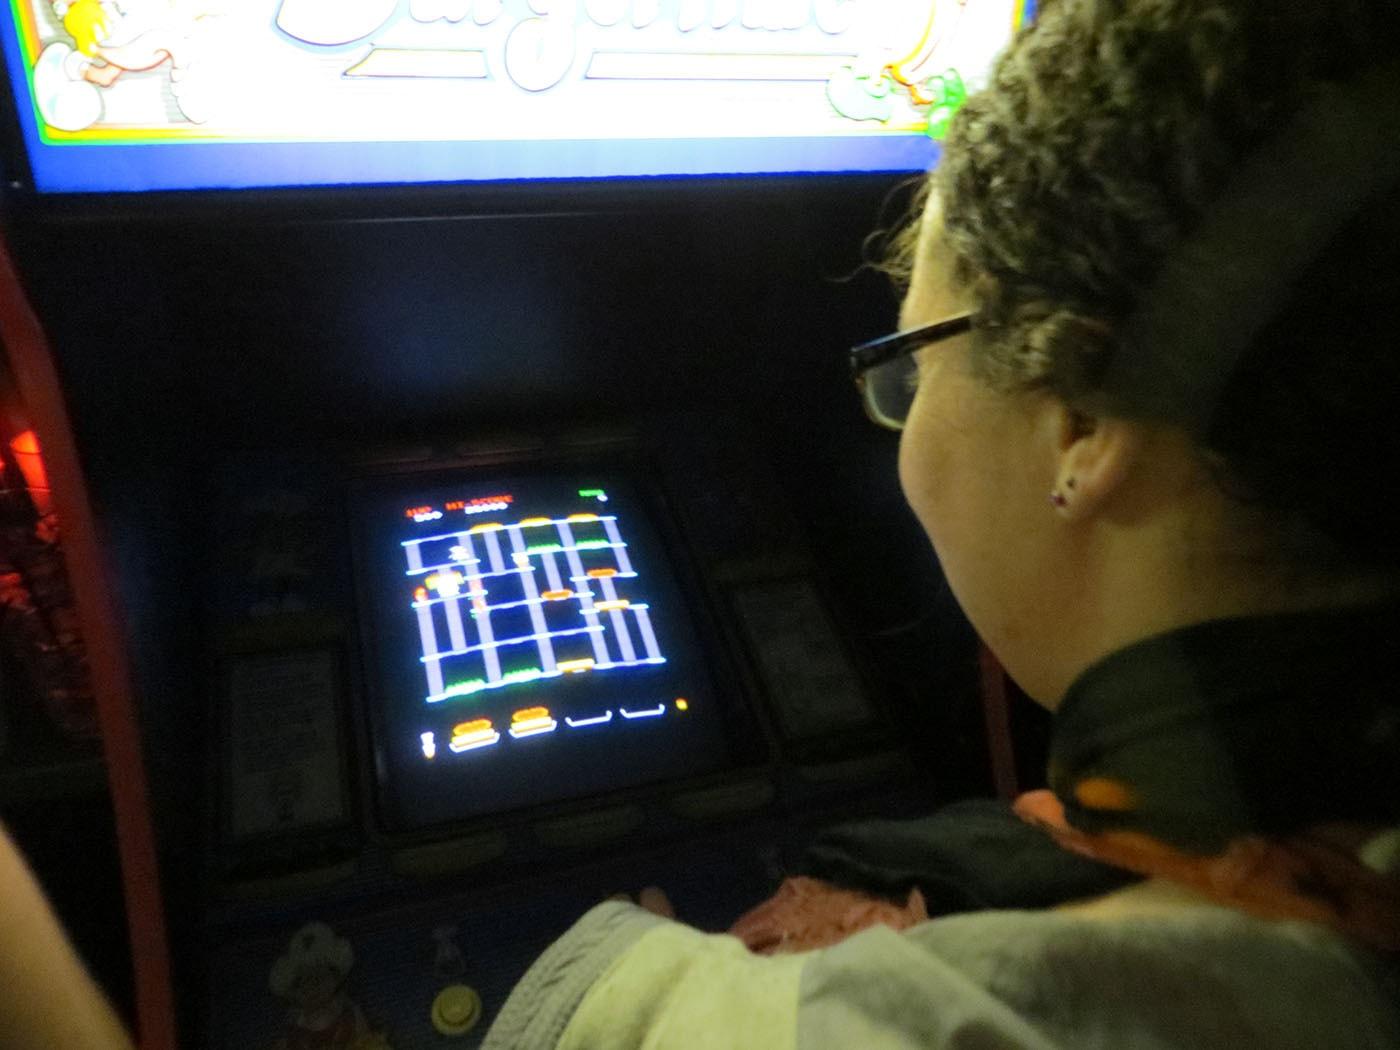 Emporium Arcade Bar in Wicker Park, Chicago, Illinois